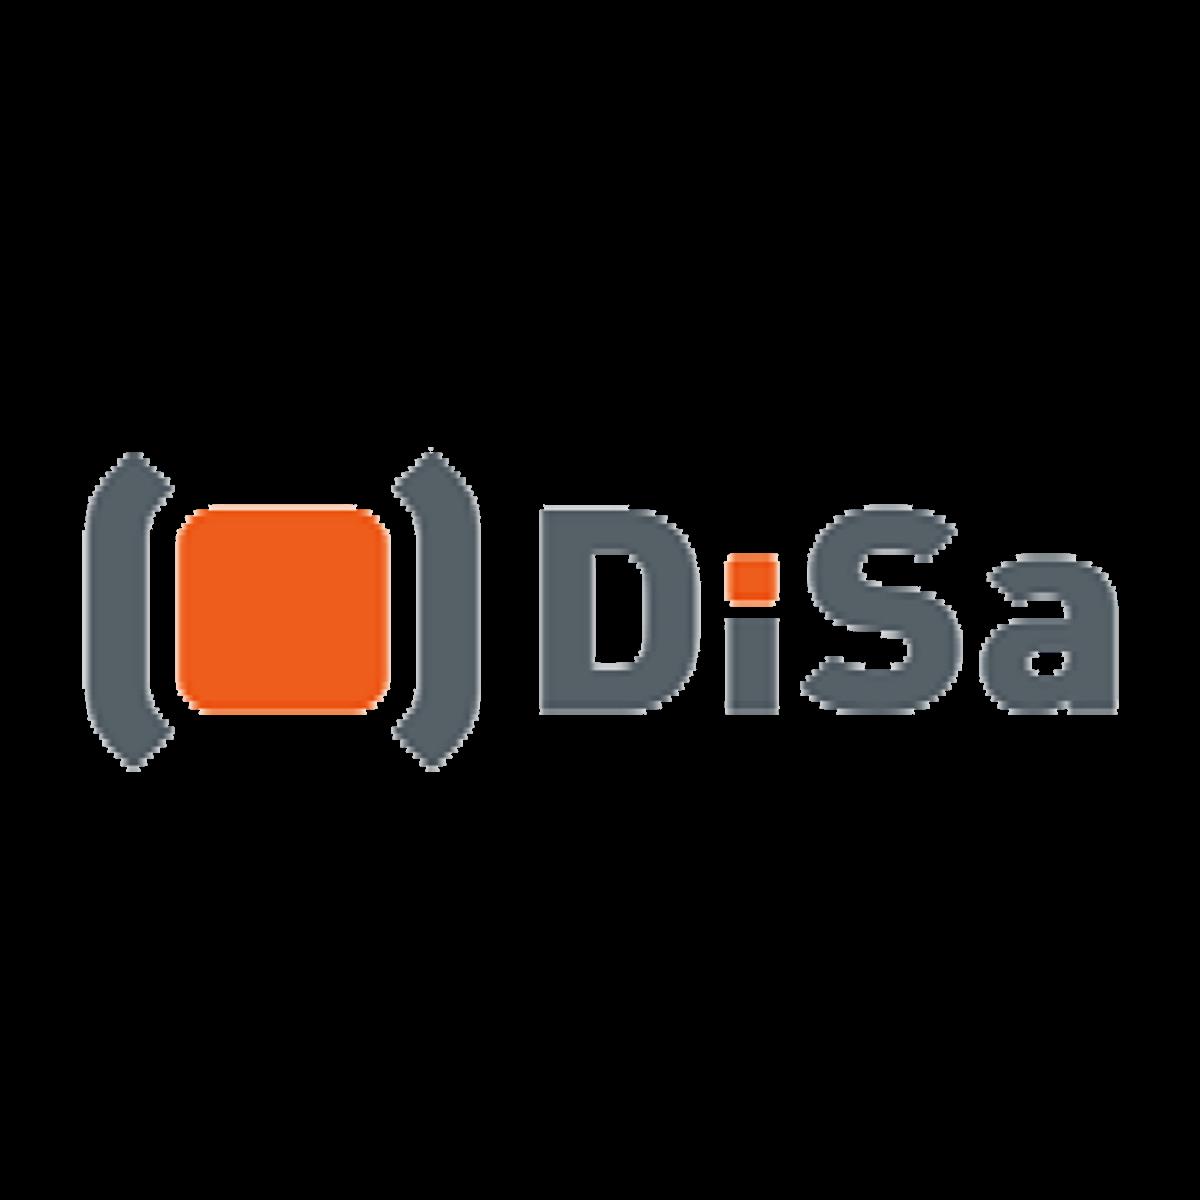 DISA Company Announcements (SGX:532) | SG investors io